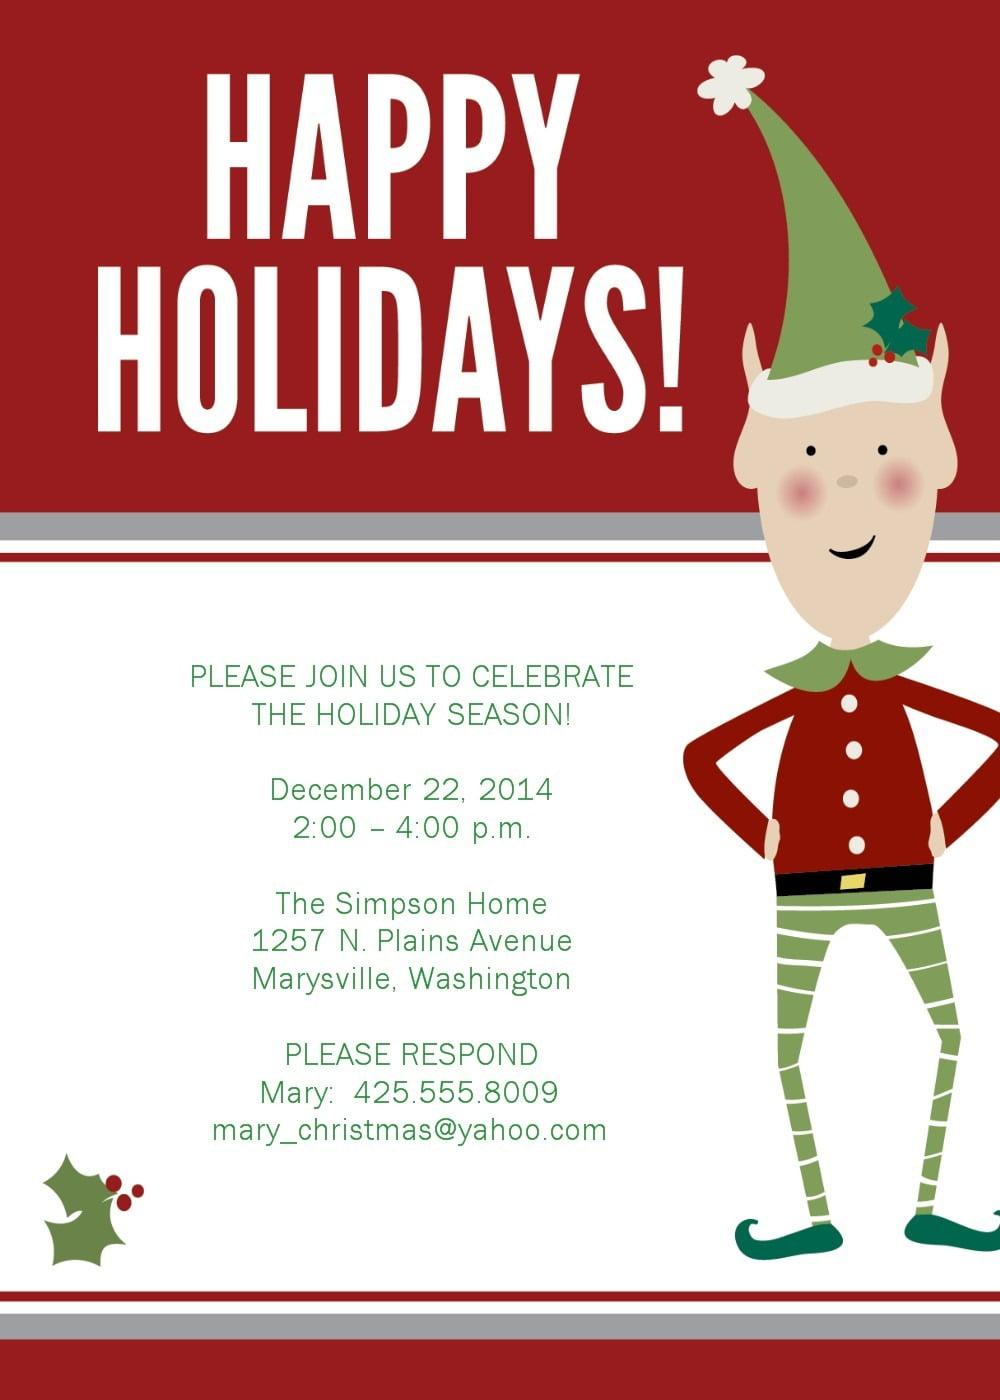 Free Templates Christmas Invitations Image – 20 Christmas